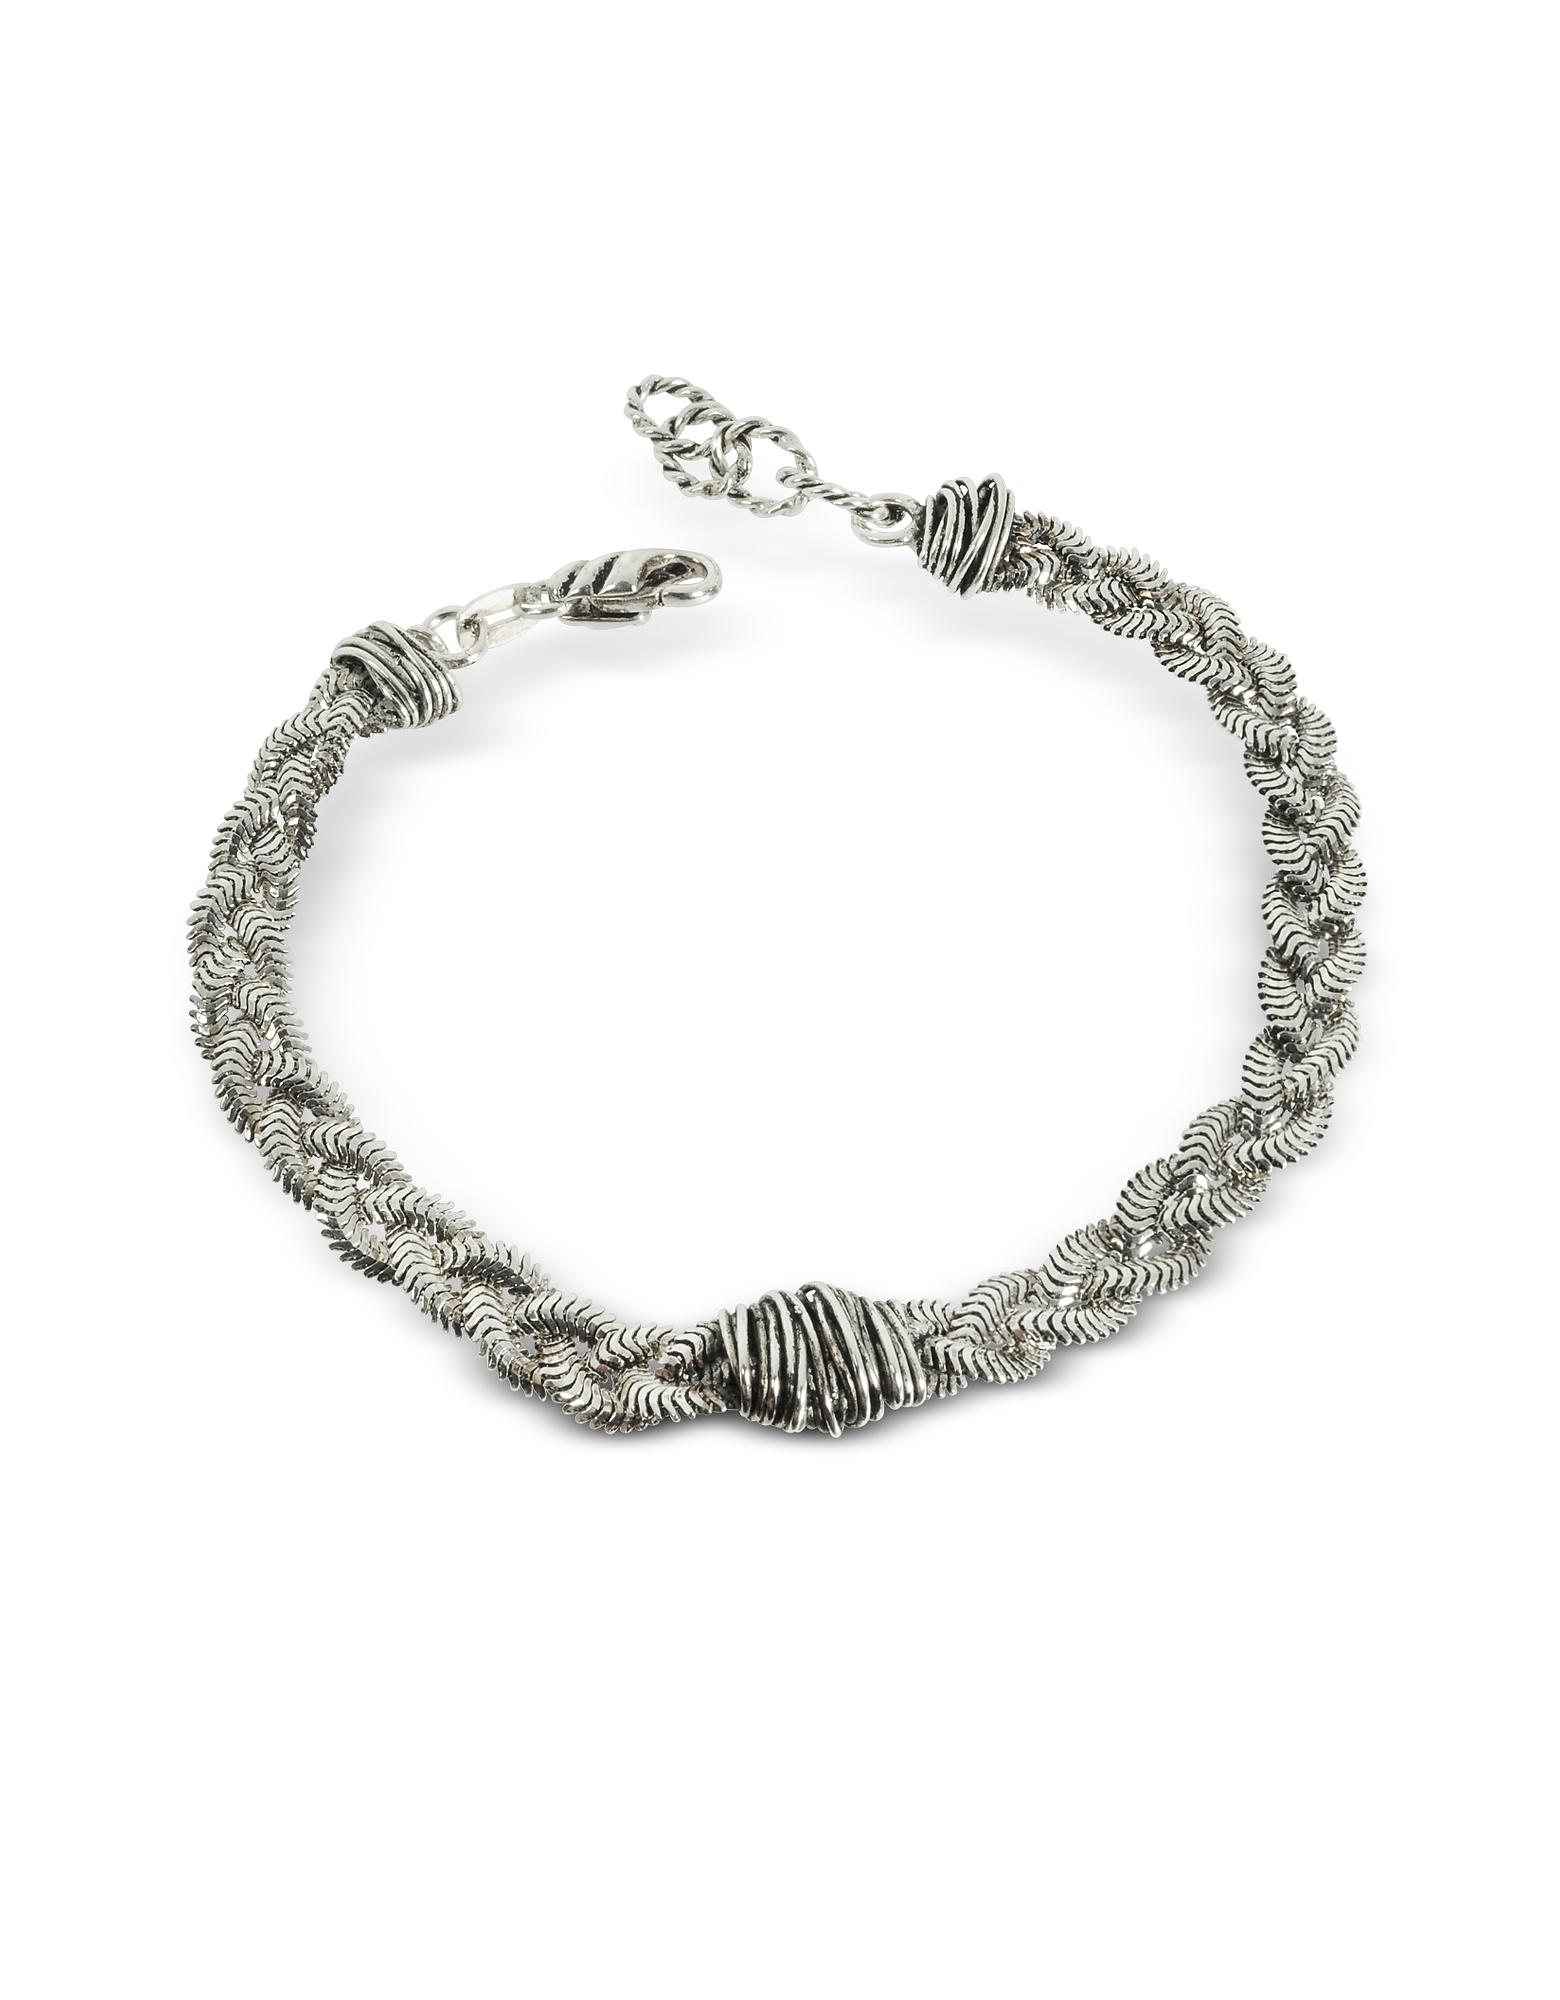 Giacomo Burroni Men's Bracelets, Braid Bracelet w/Etruscan Knot